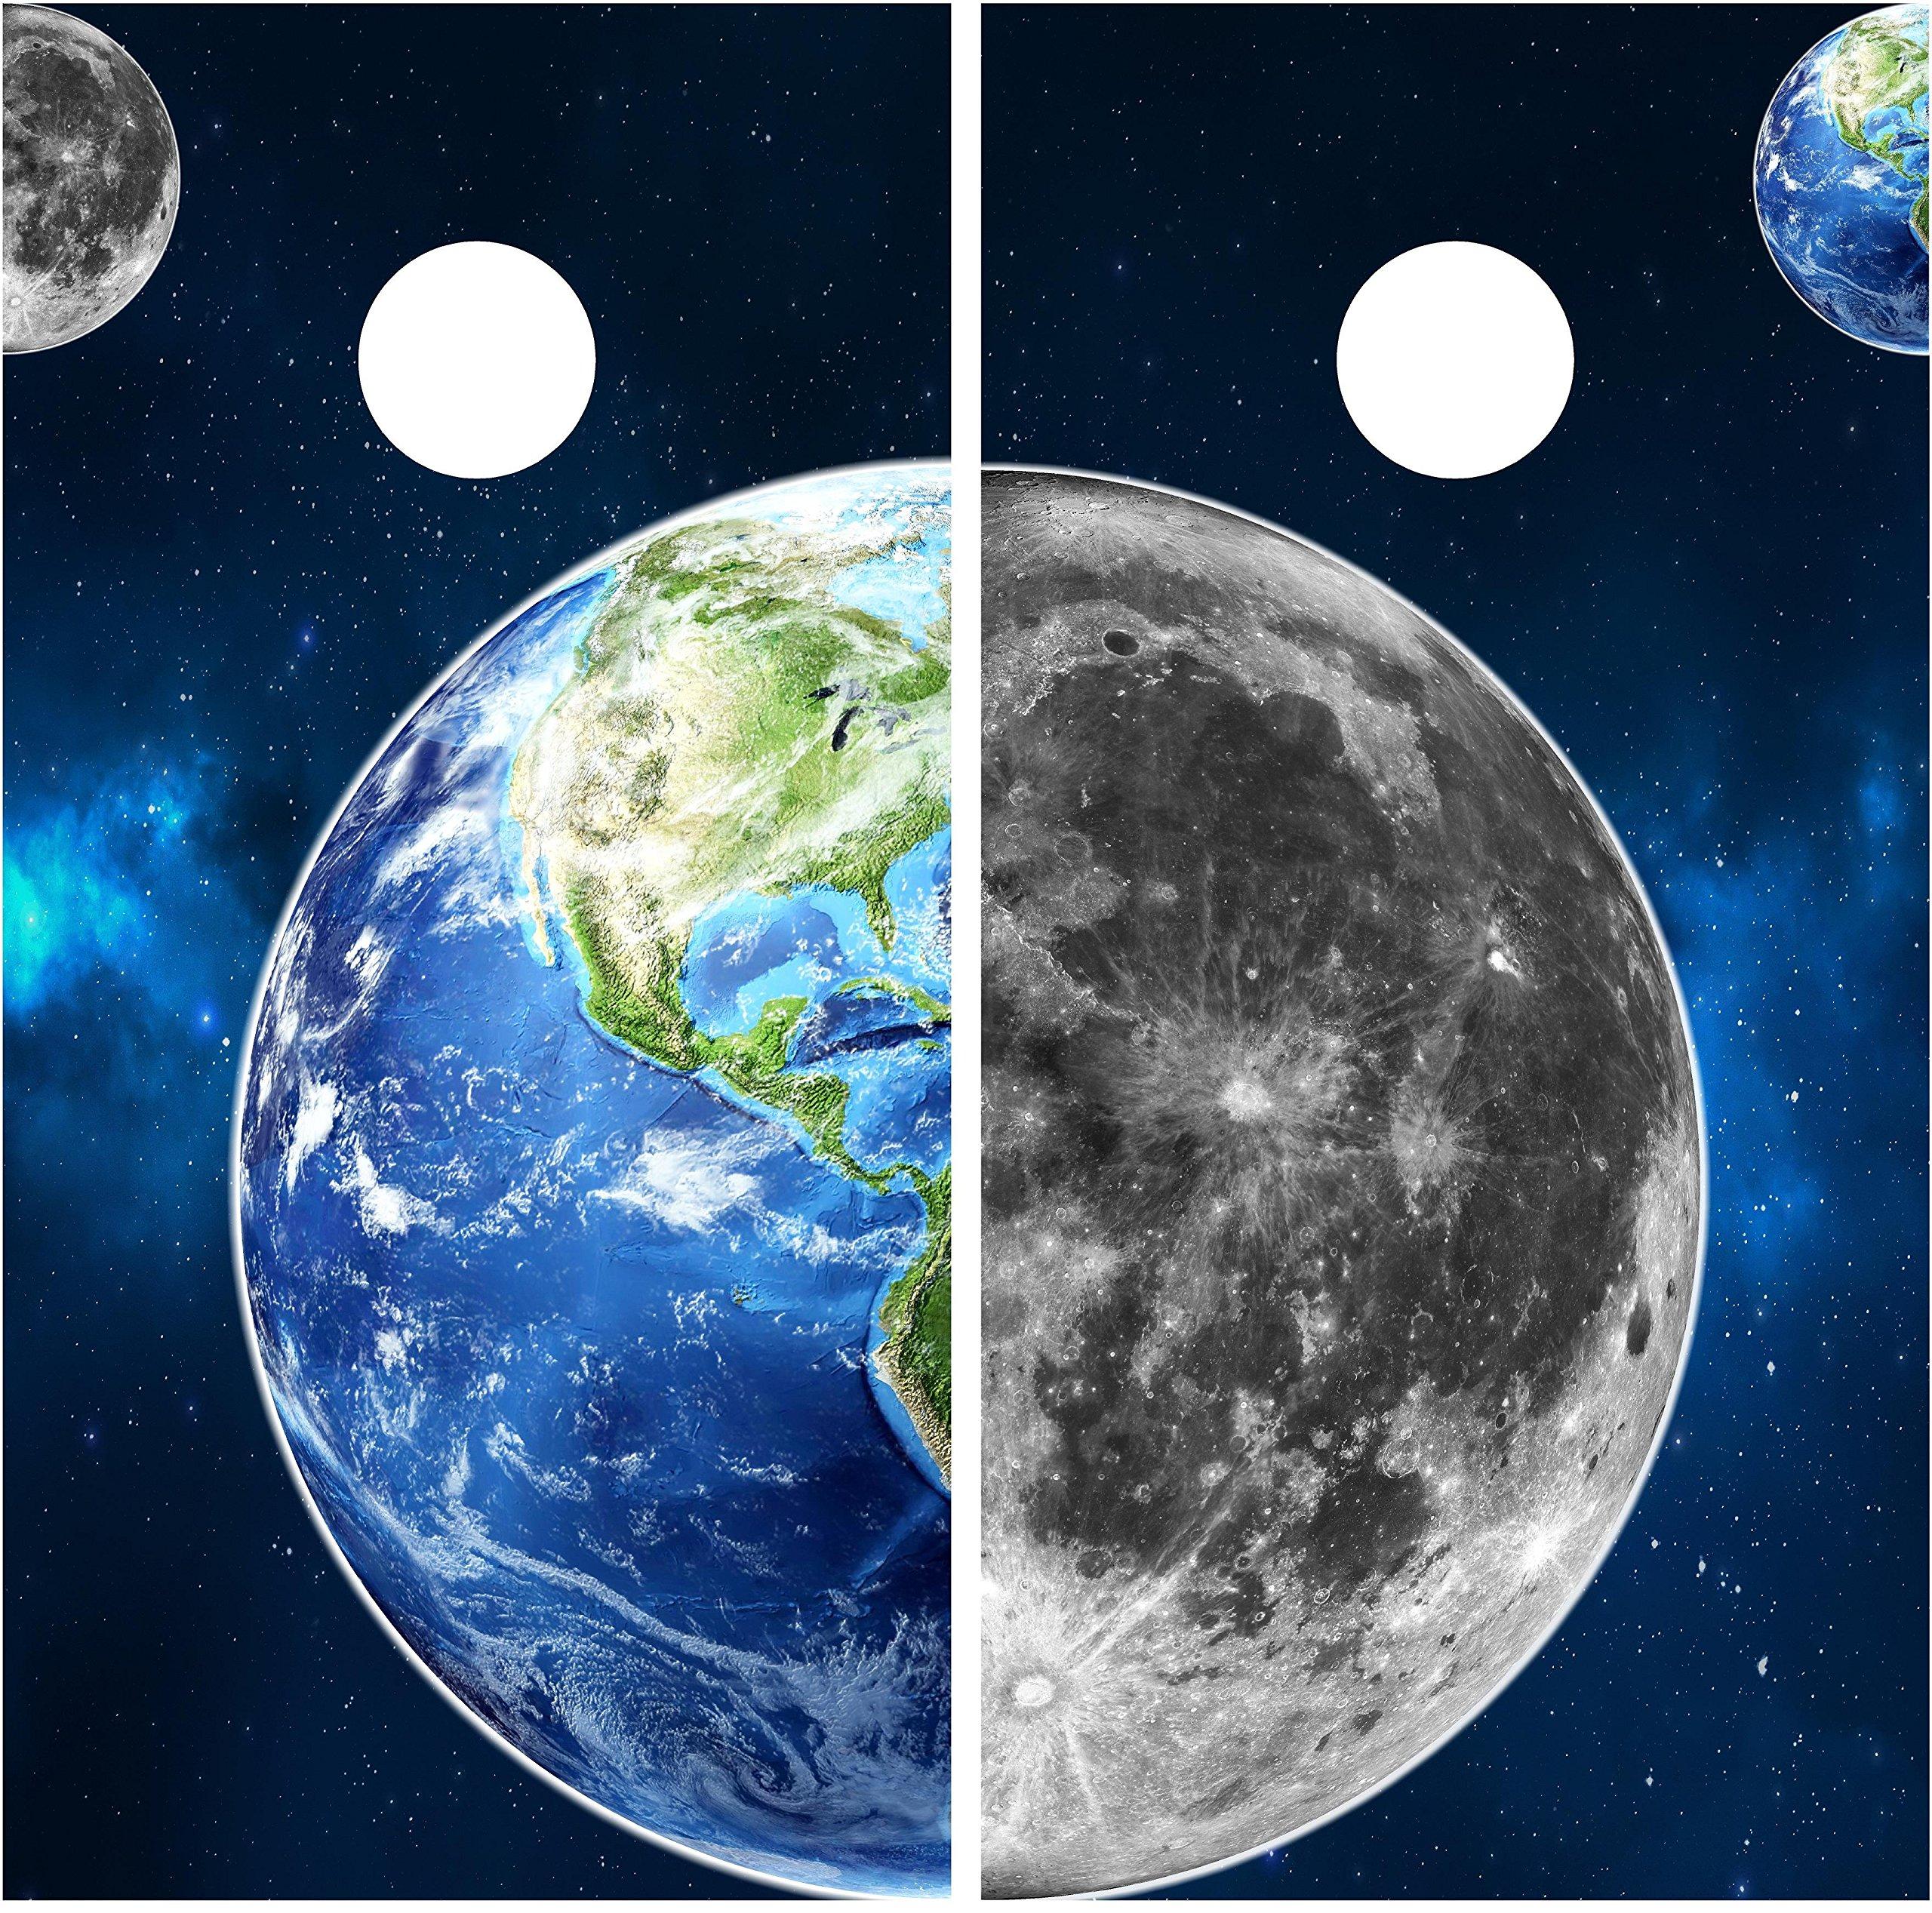 Earth & Moon Cornhole Wrap set, 2 decals (24'' x 48'') Space Solar system Custom Nebula Milky Way Galaxy Graphic sticker Backyard boards game by Stickit Graphix (Image #2)